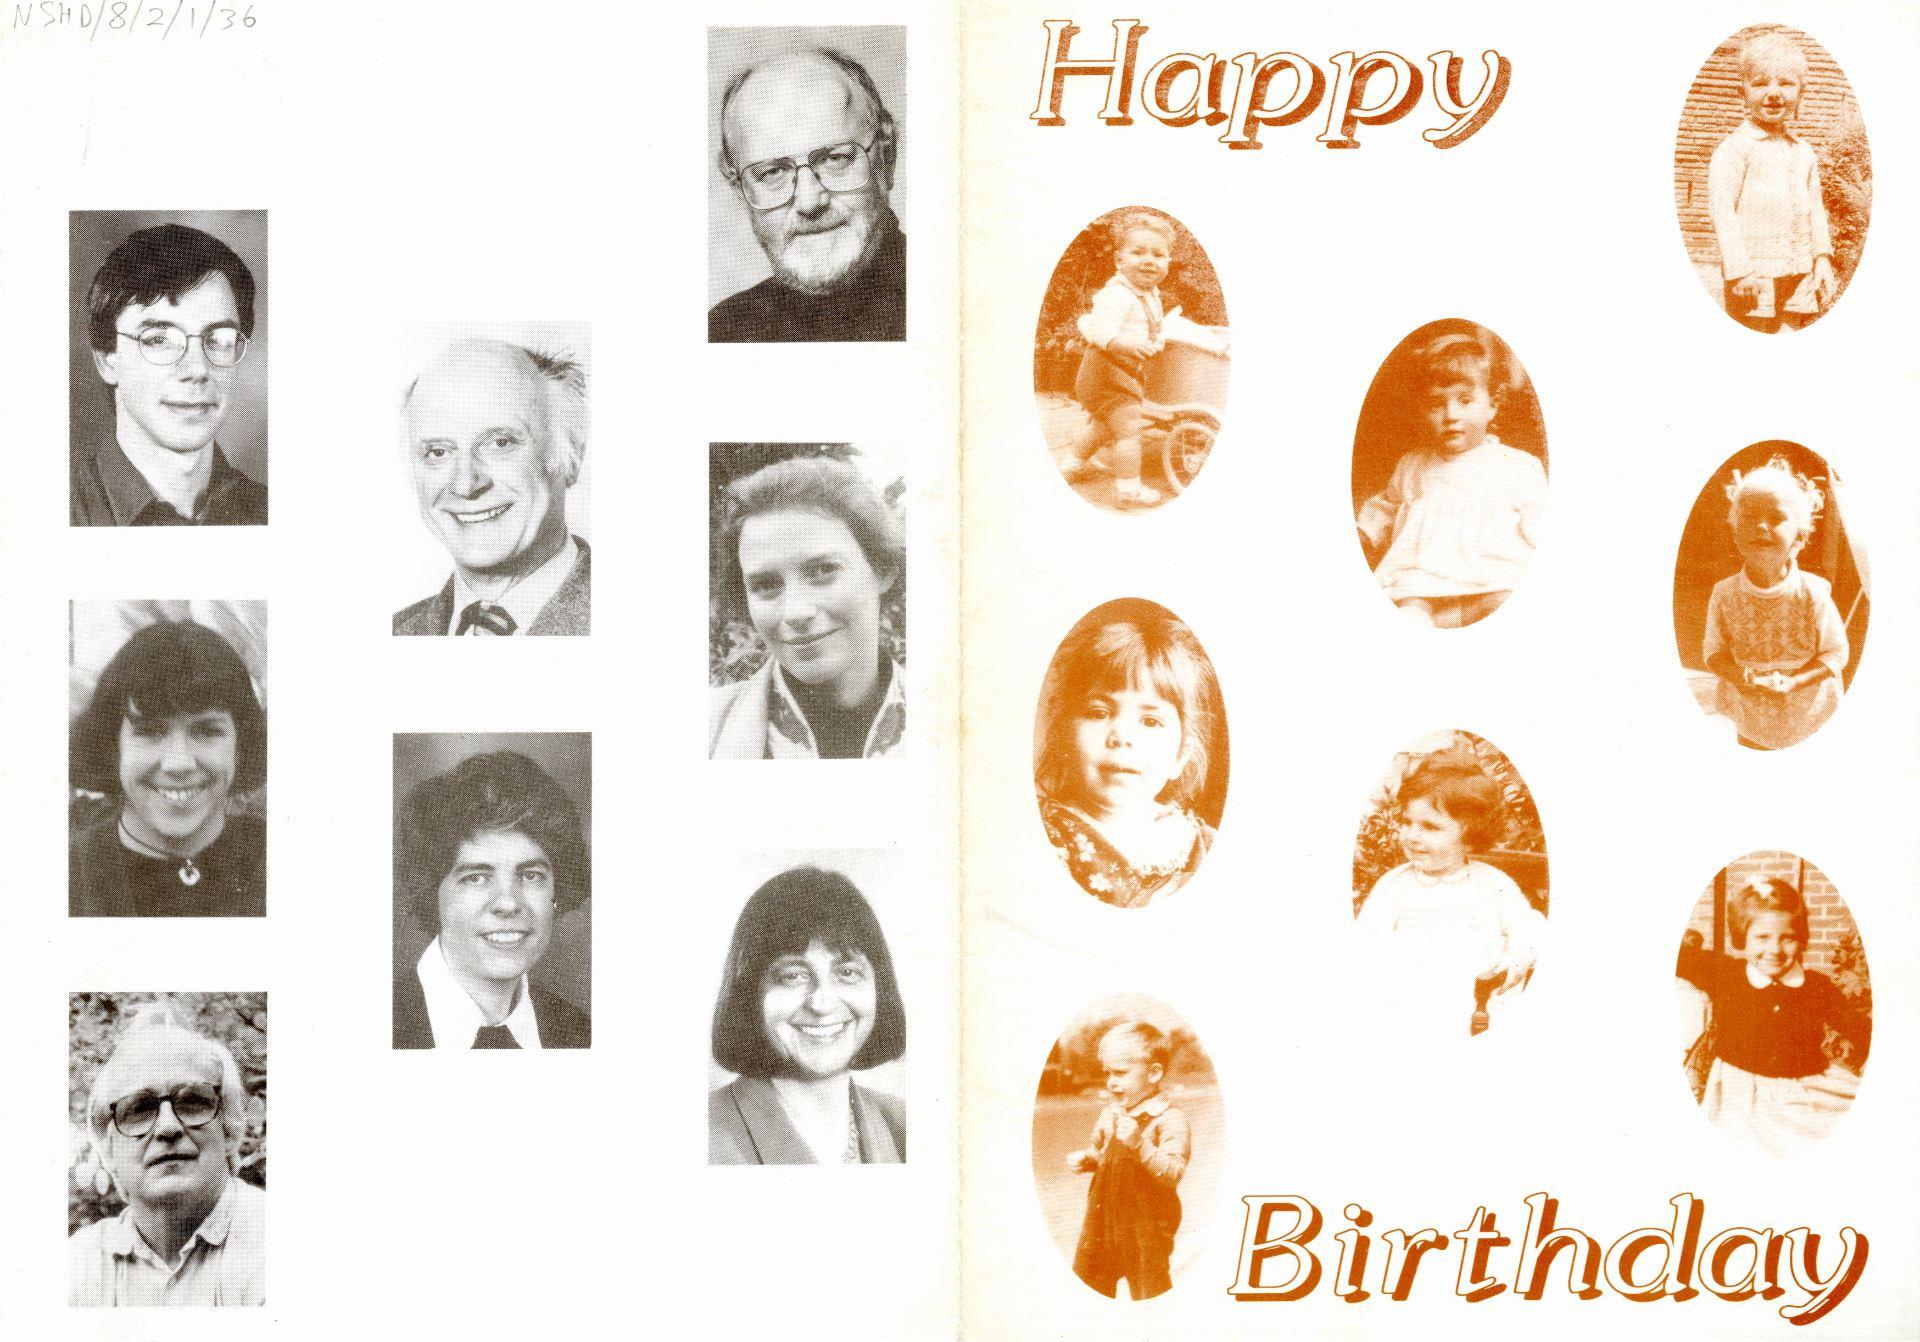 The 1996 NSHD birthday card design.